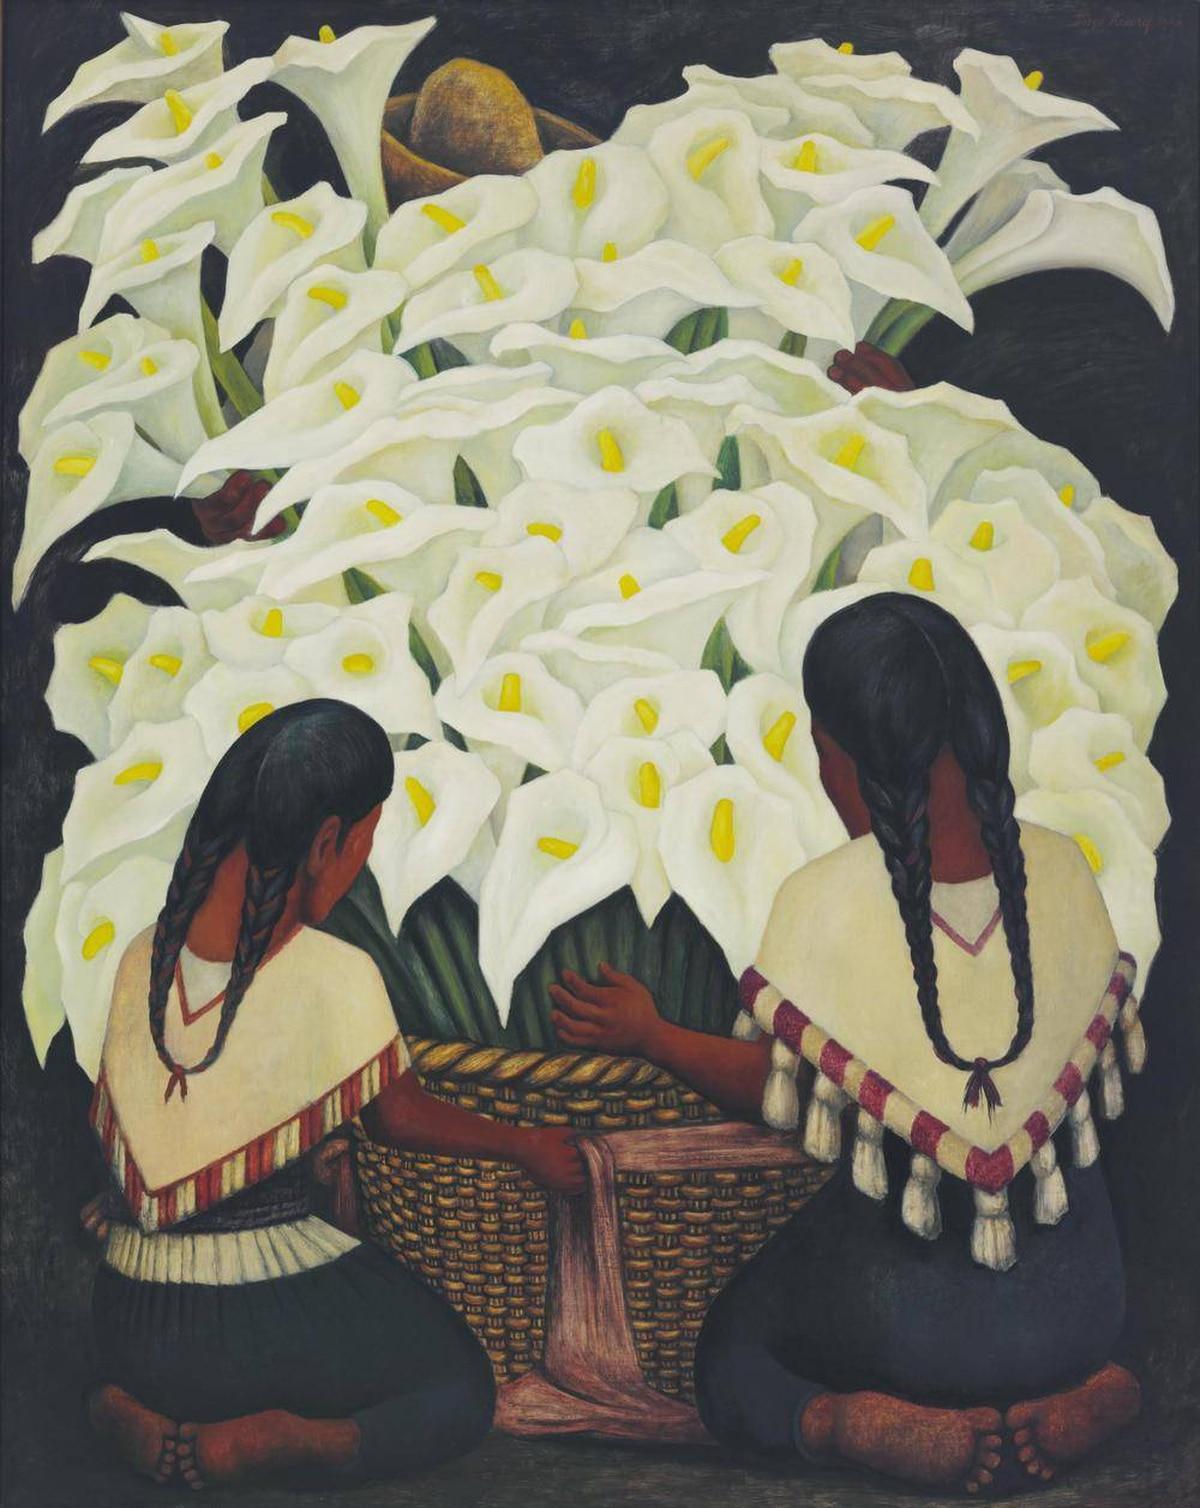 The Jacques and Natasha Gelman Collection of Mexican Art (C) Banco de México Diego Rivera & Frida Kahlo Museums Trust, Mexico,